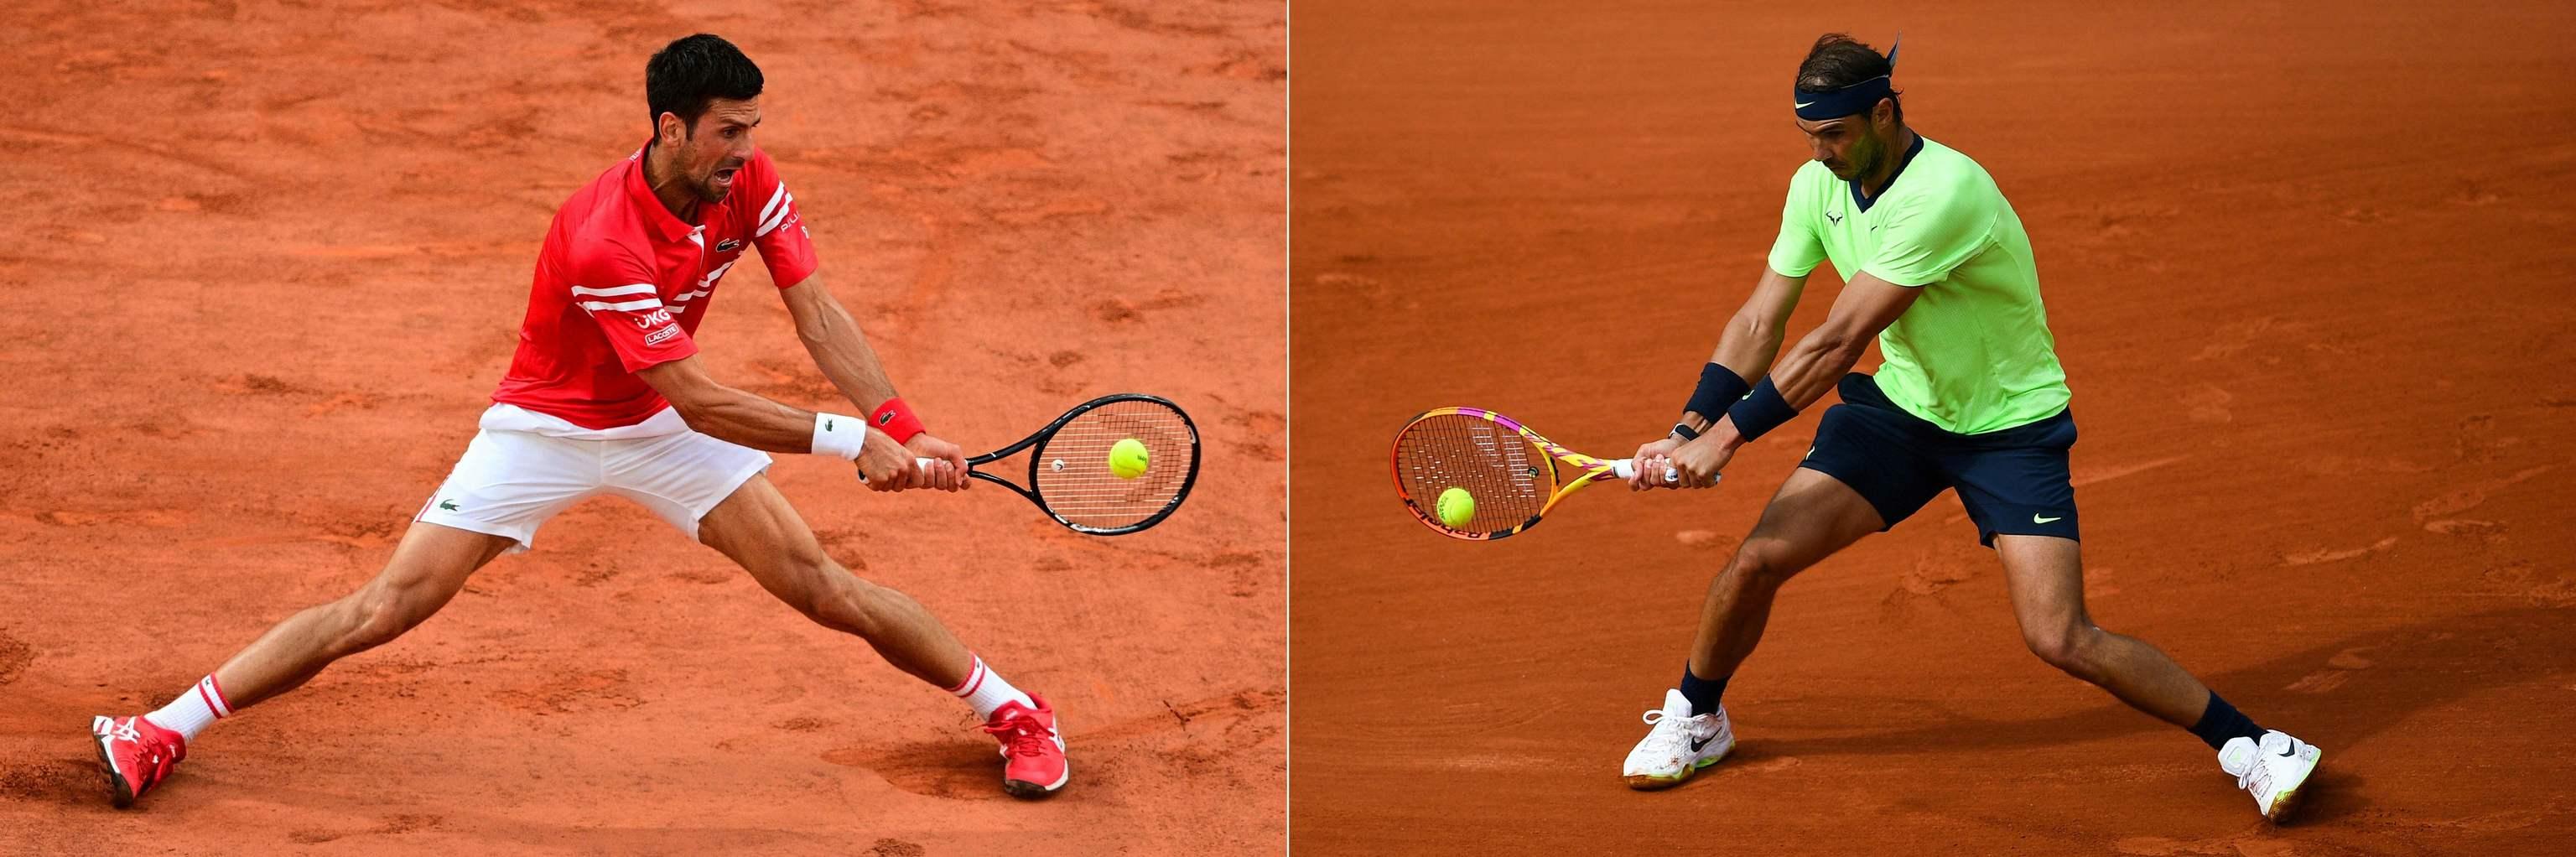 Novak Djokovic y Rafa Nadal, en Roland Garros 2021.